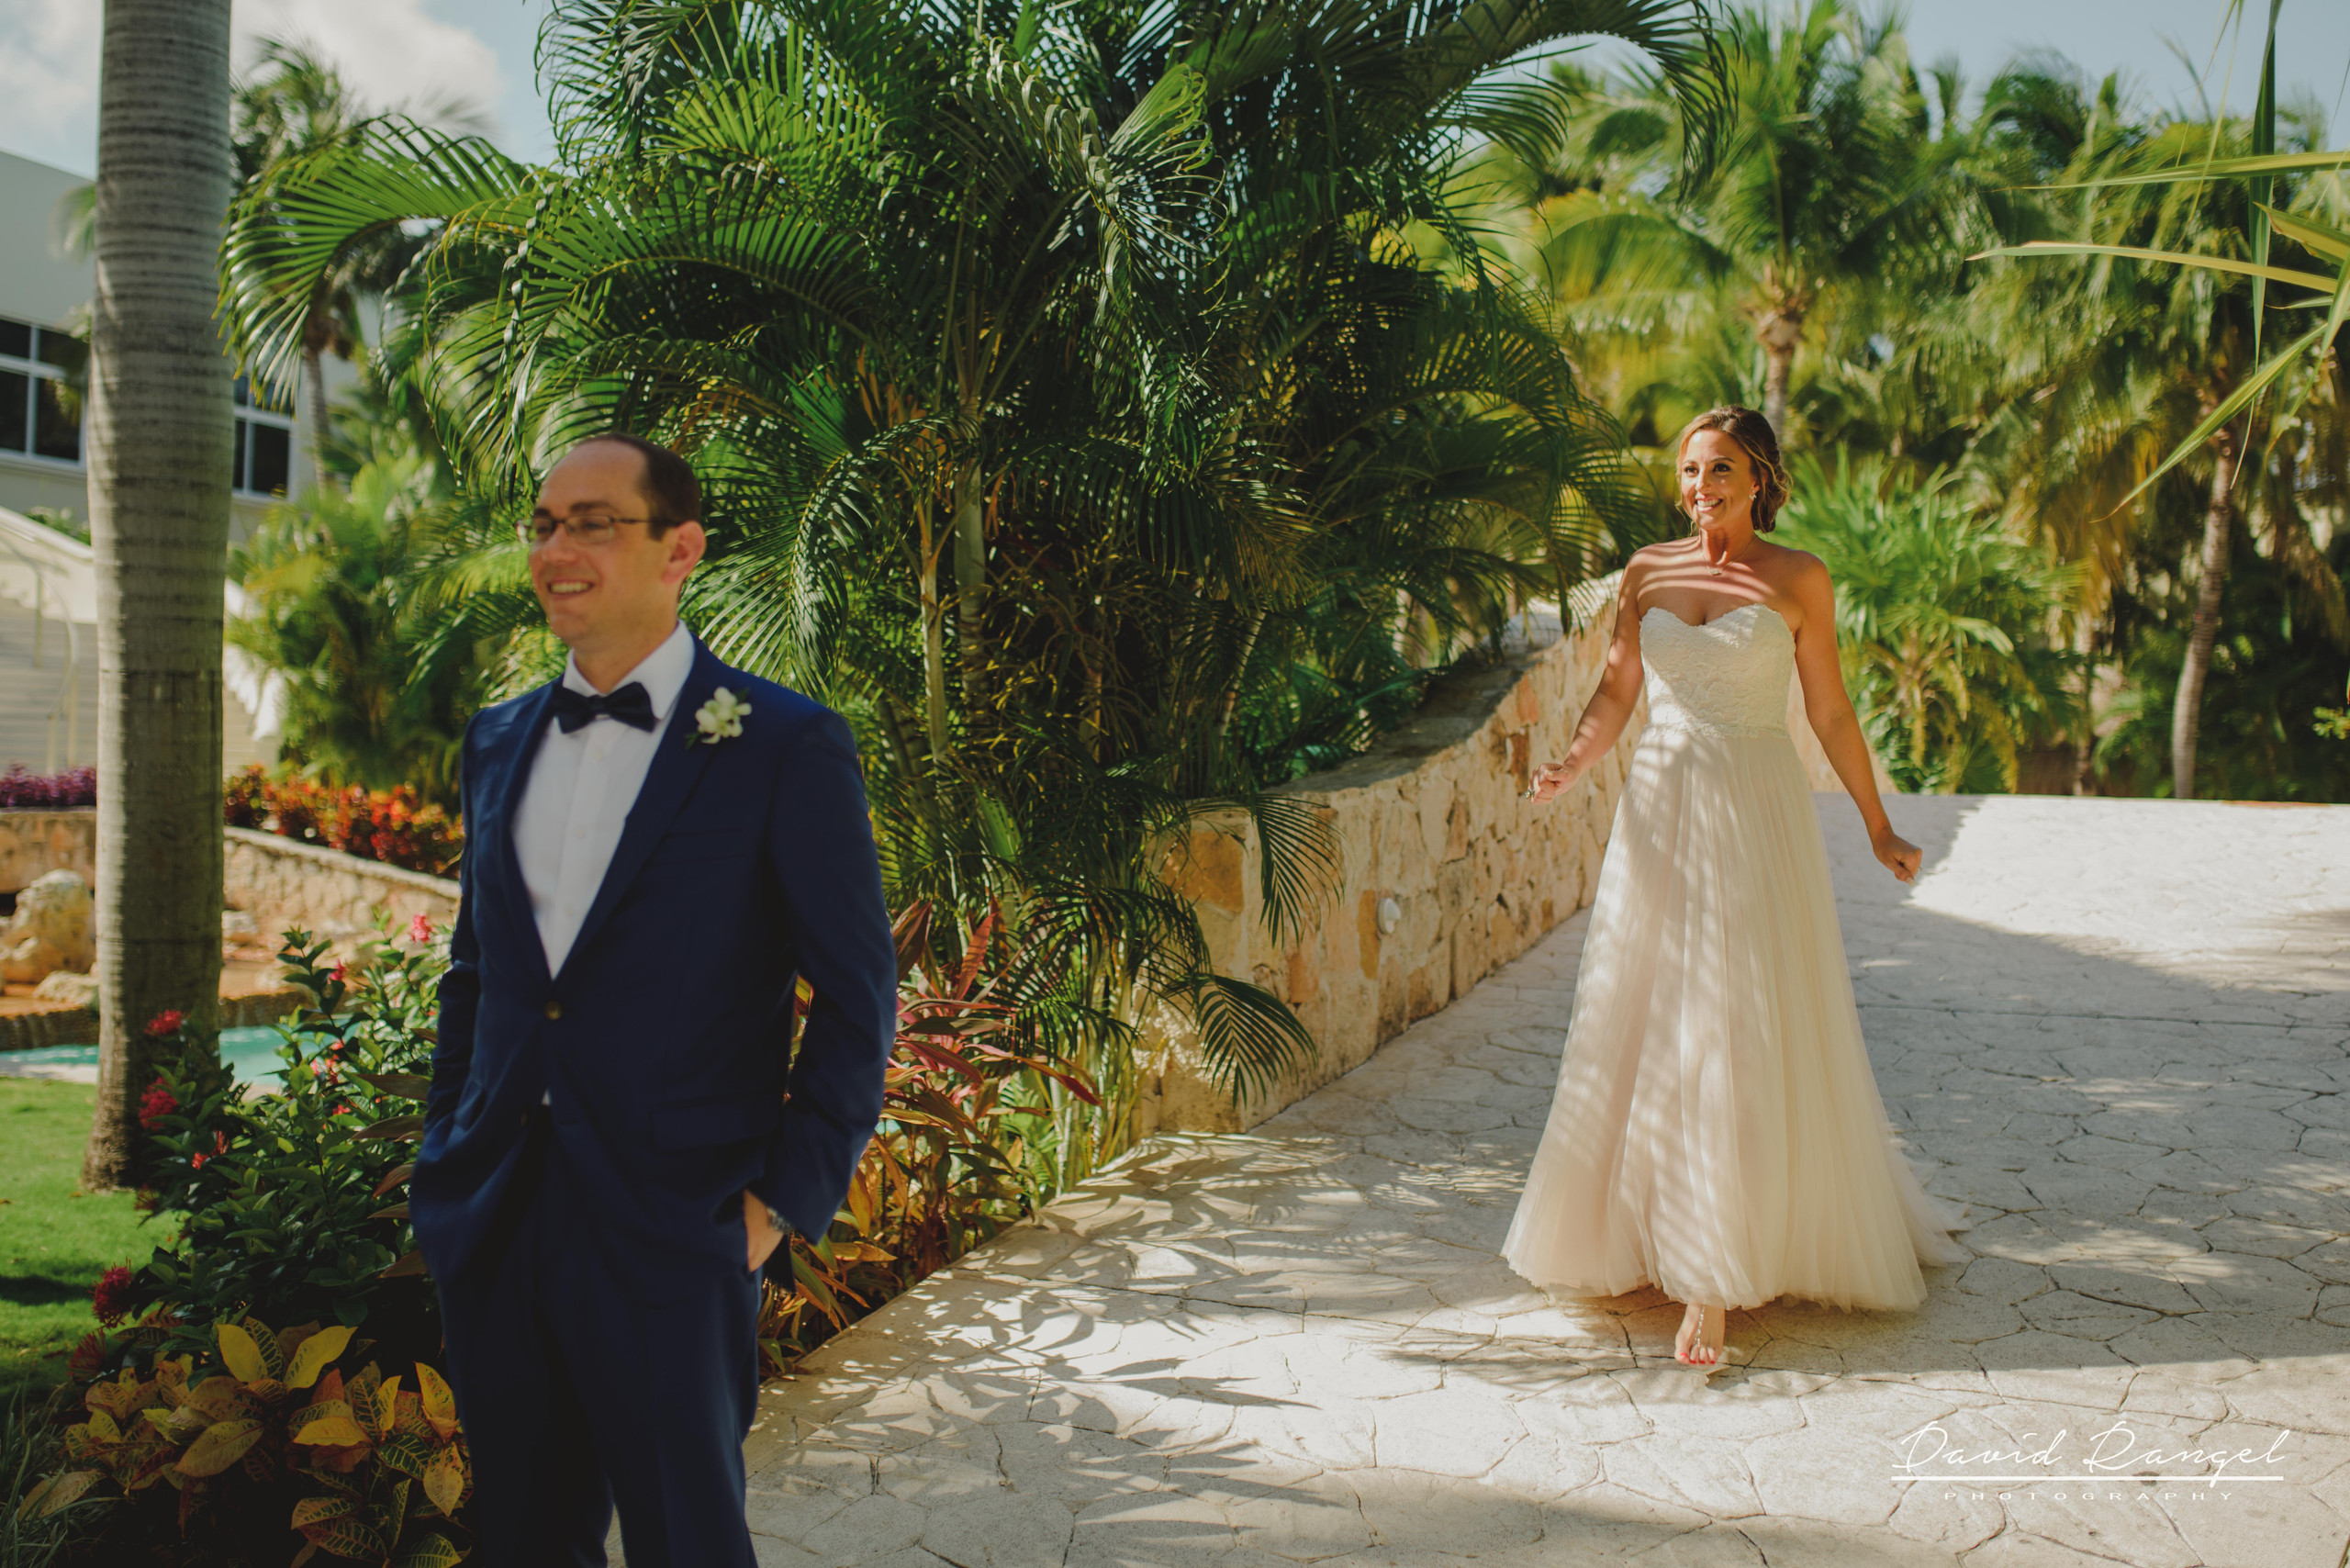 first+look+bride+groom+dress+wedding+photo+garden